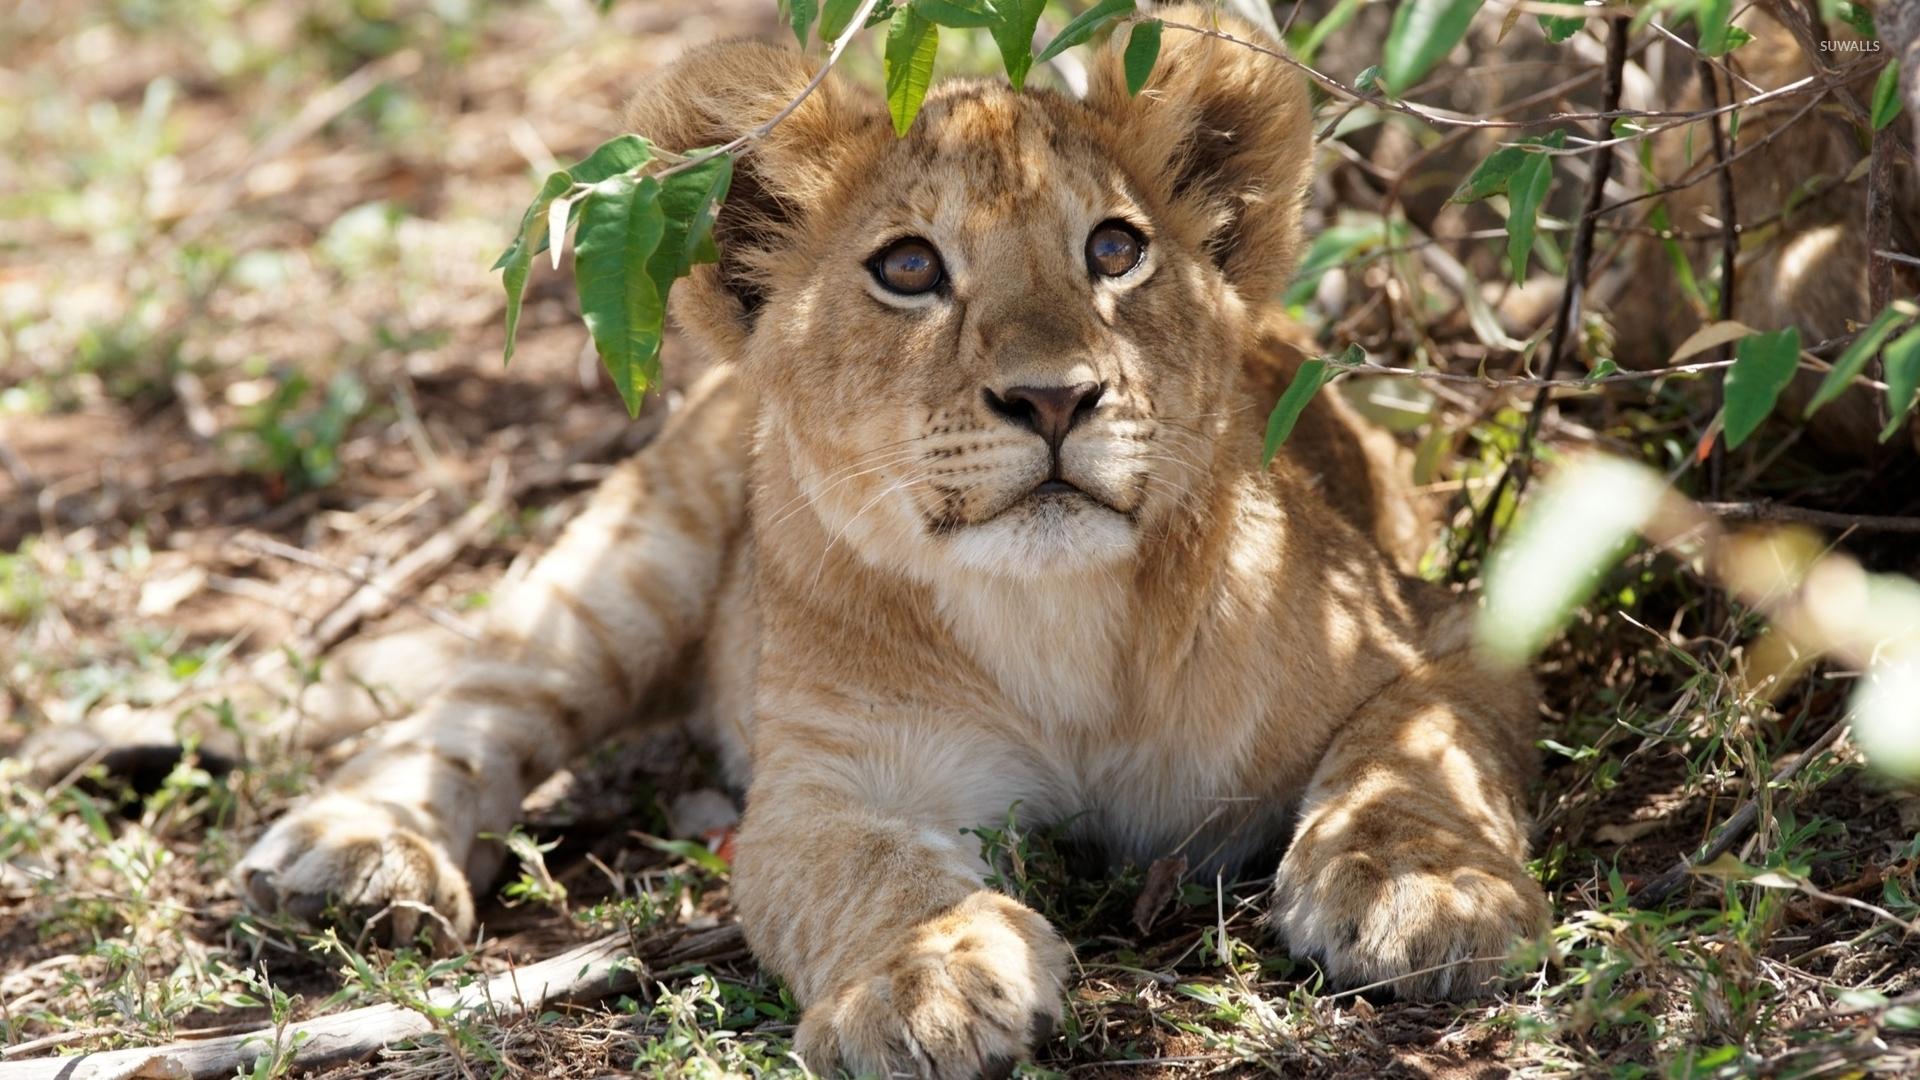 Cute Cubs Wallpaper Cute Lion Cub Looking Up Wallpaper Animal Wallpapers